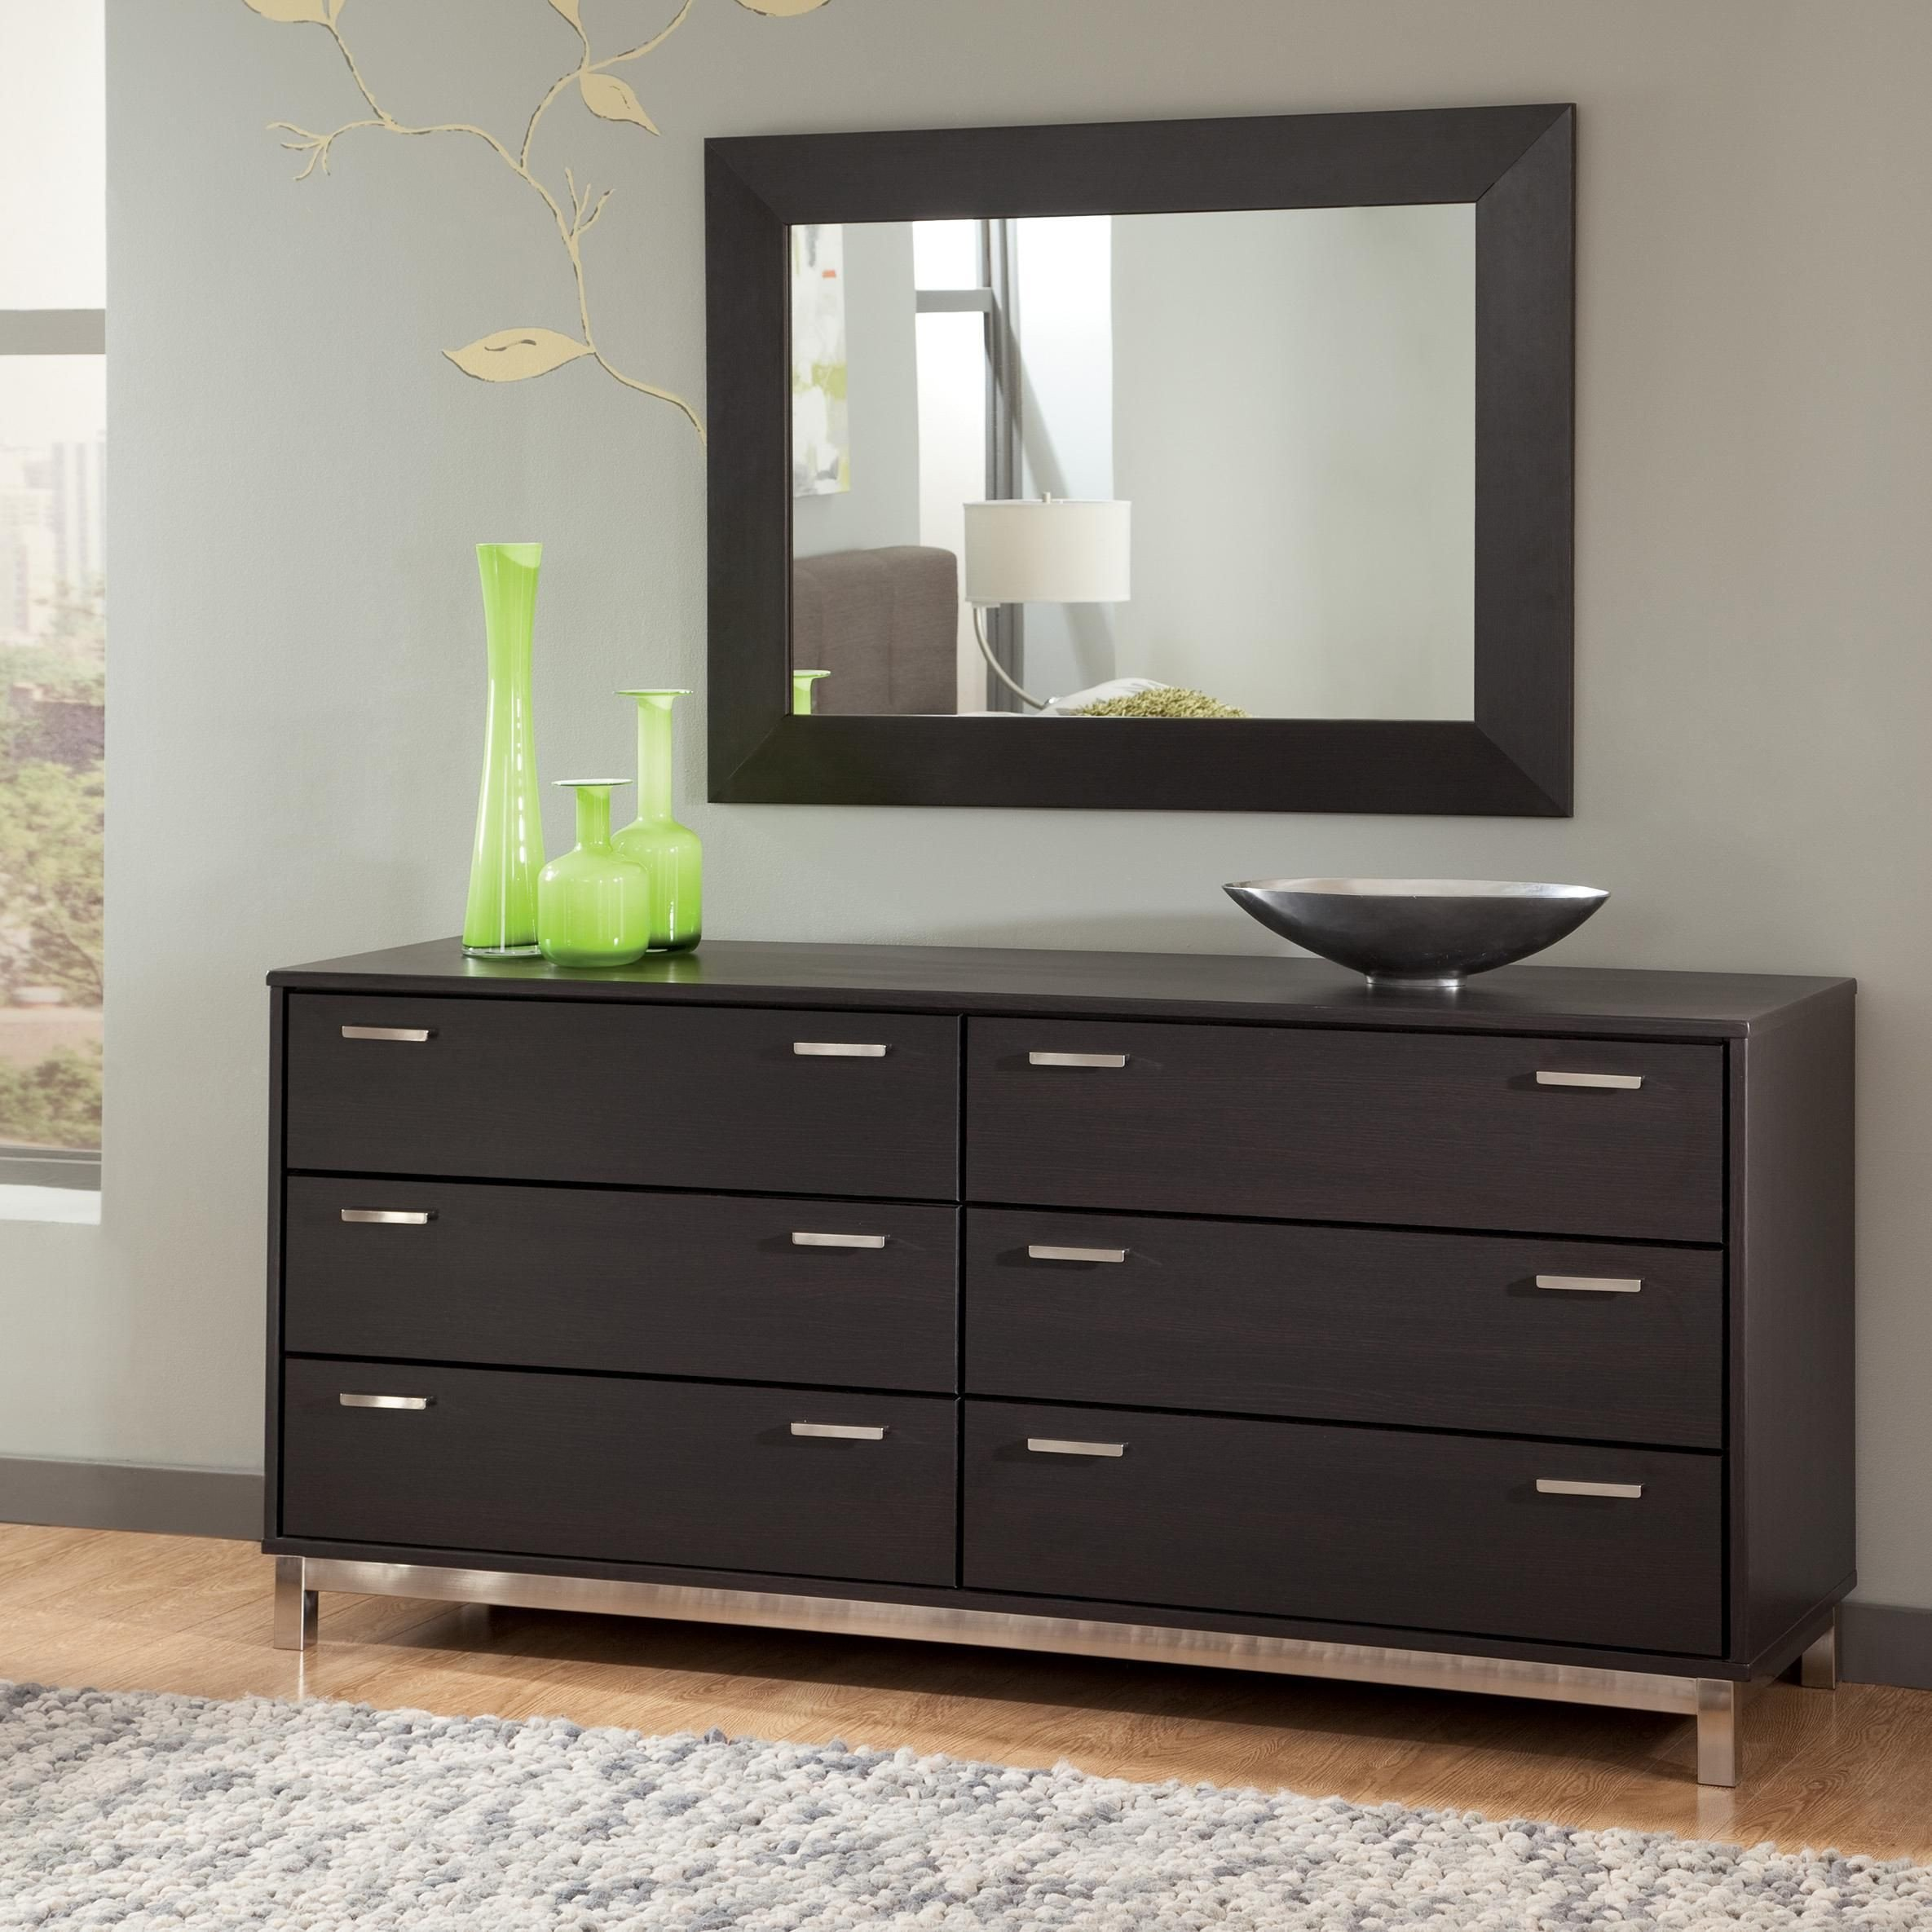 Bedroom Dressers On Sale Best Of Master Bedroom Dresser